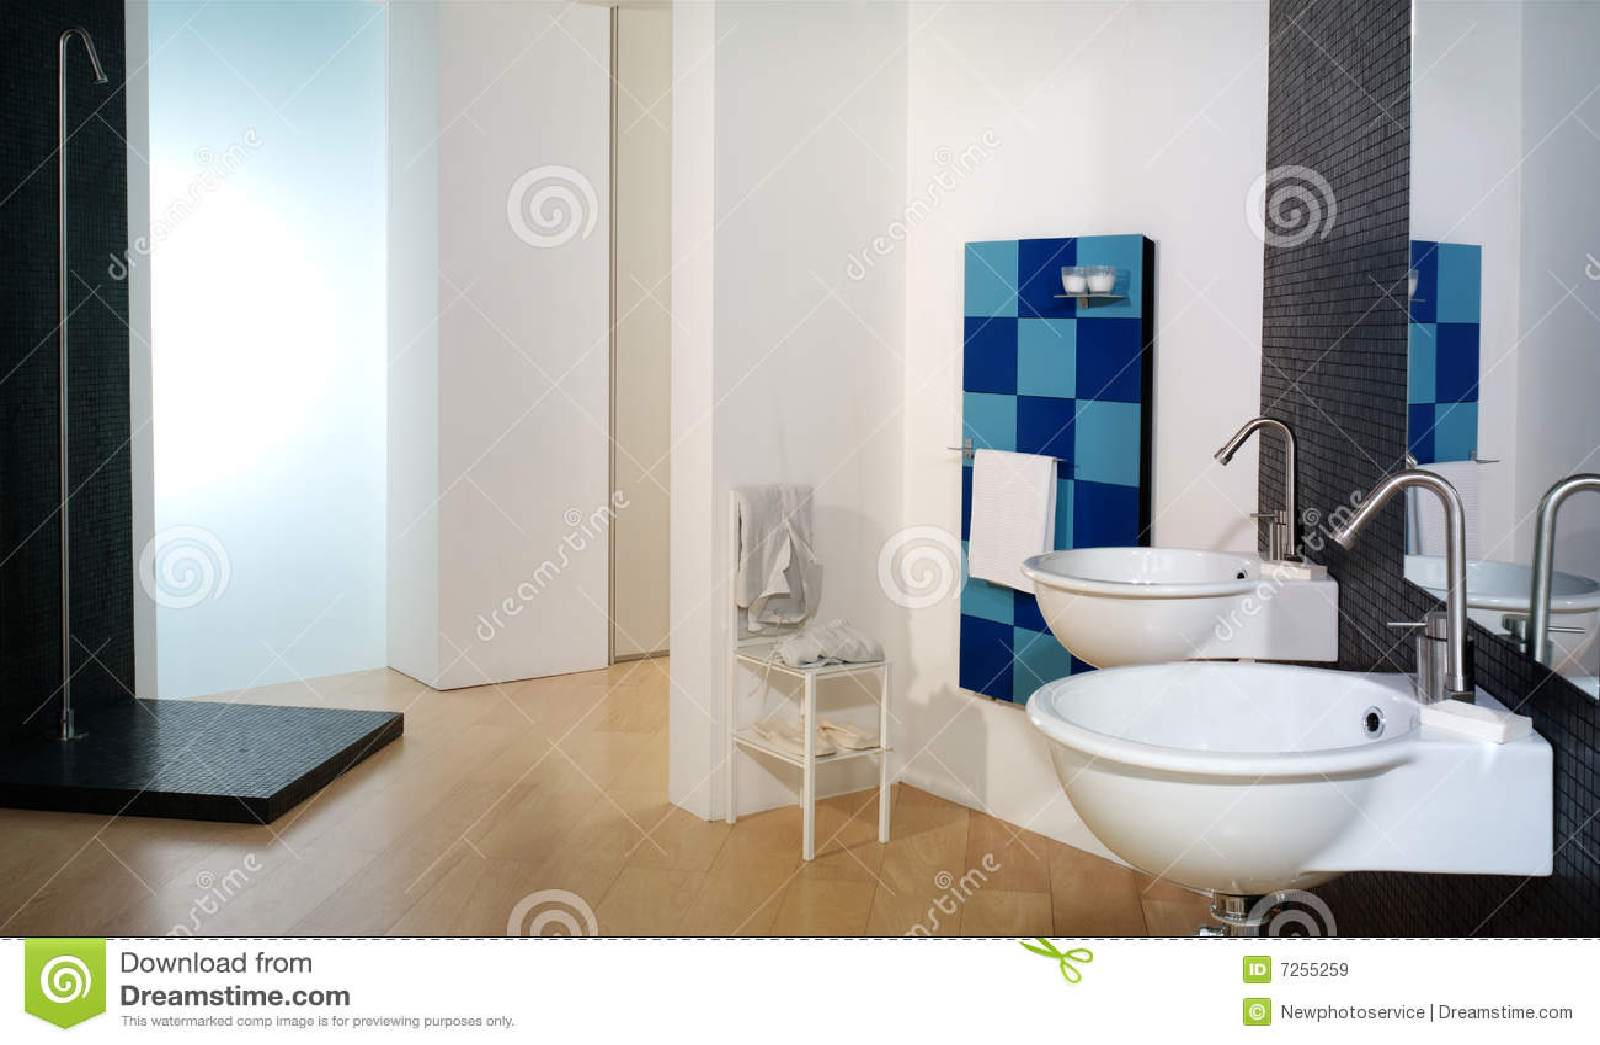 Banheiro italiano branco moderno luxuoso. #132F63 1300x866 Banheiro Branco Moderno